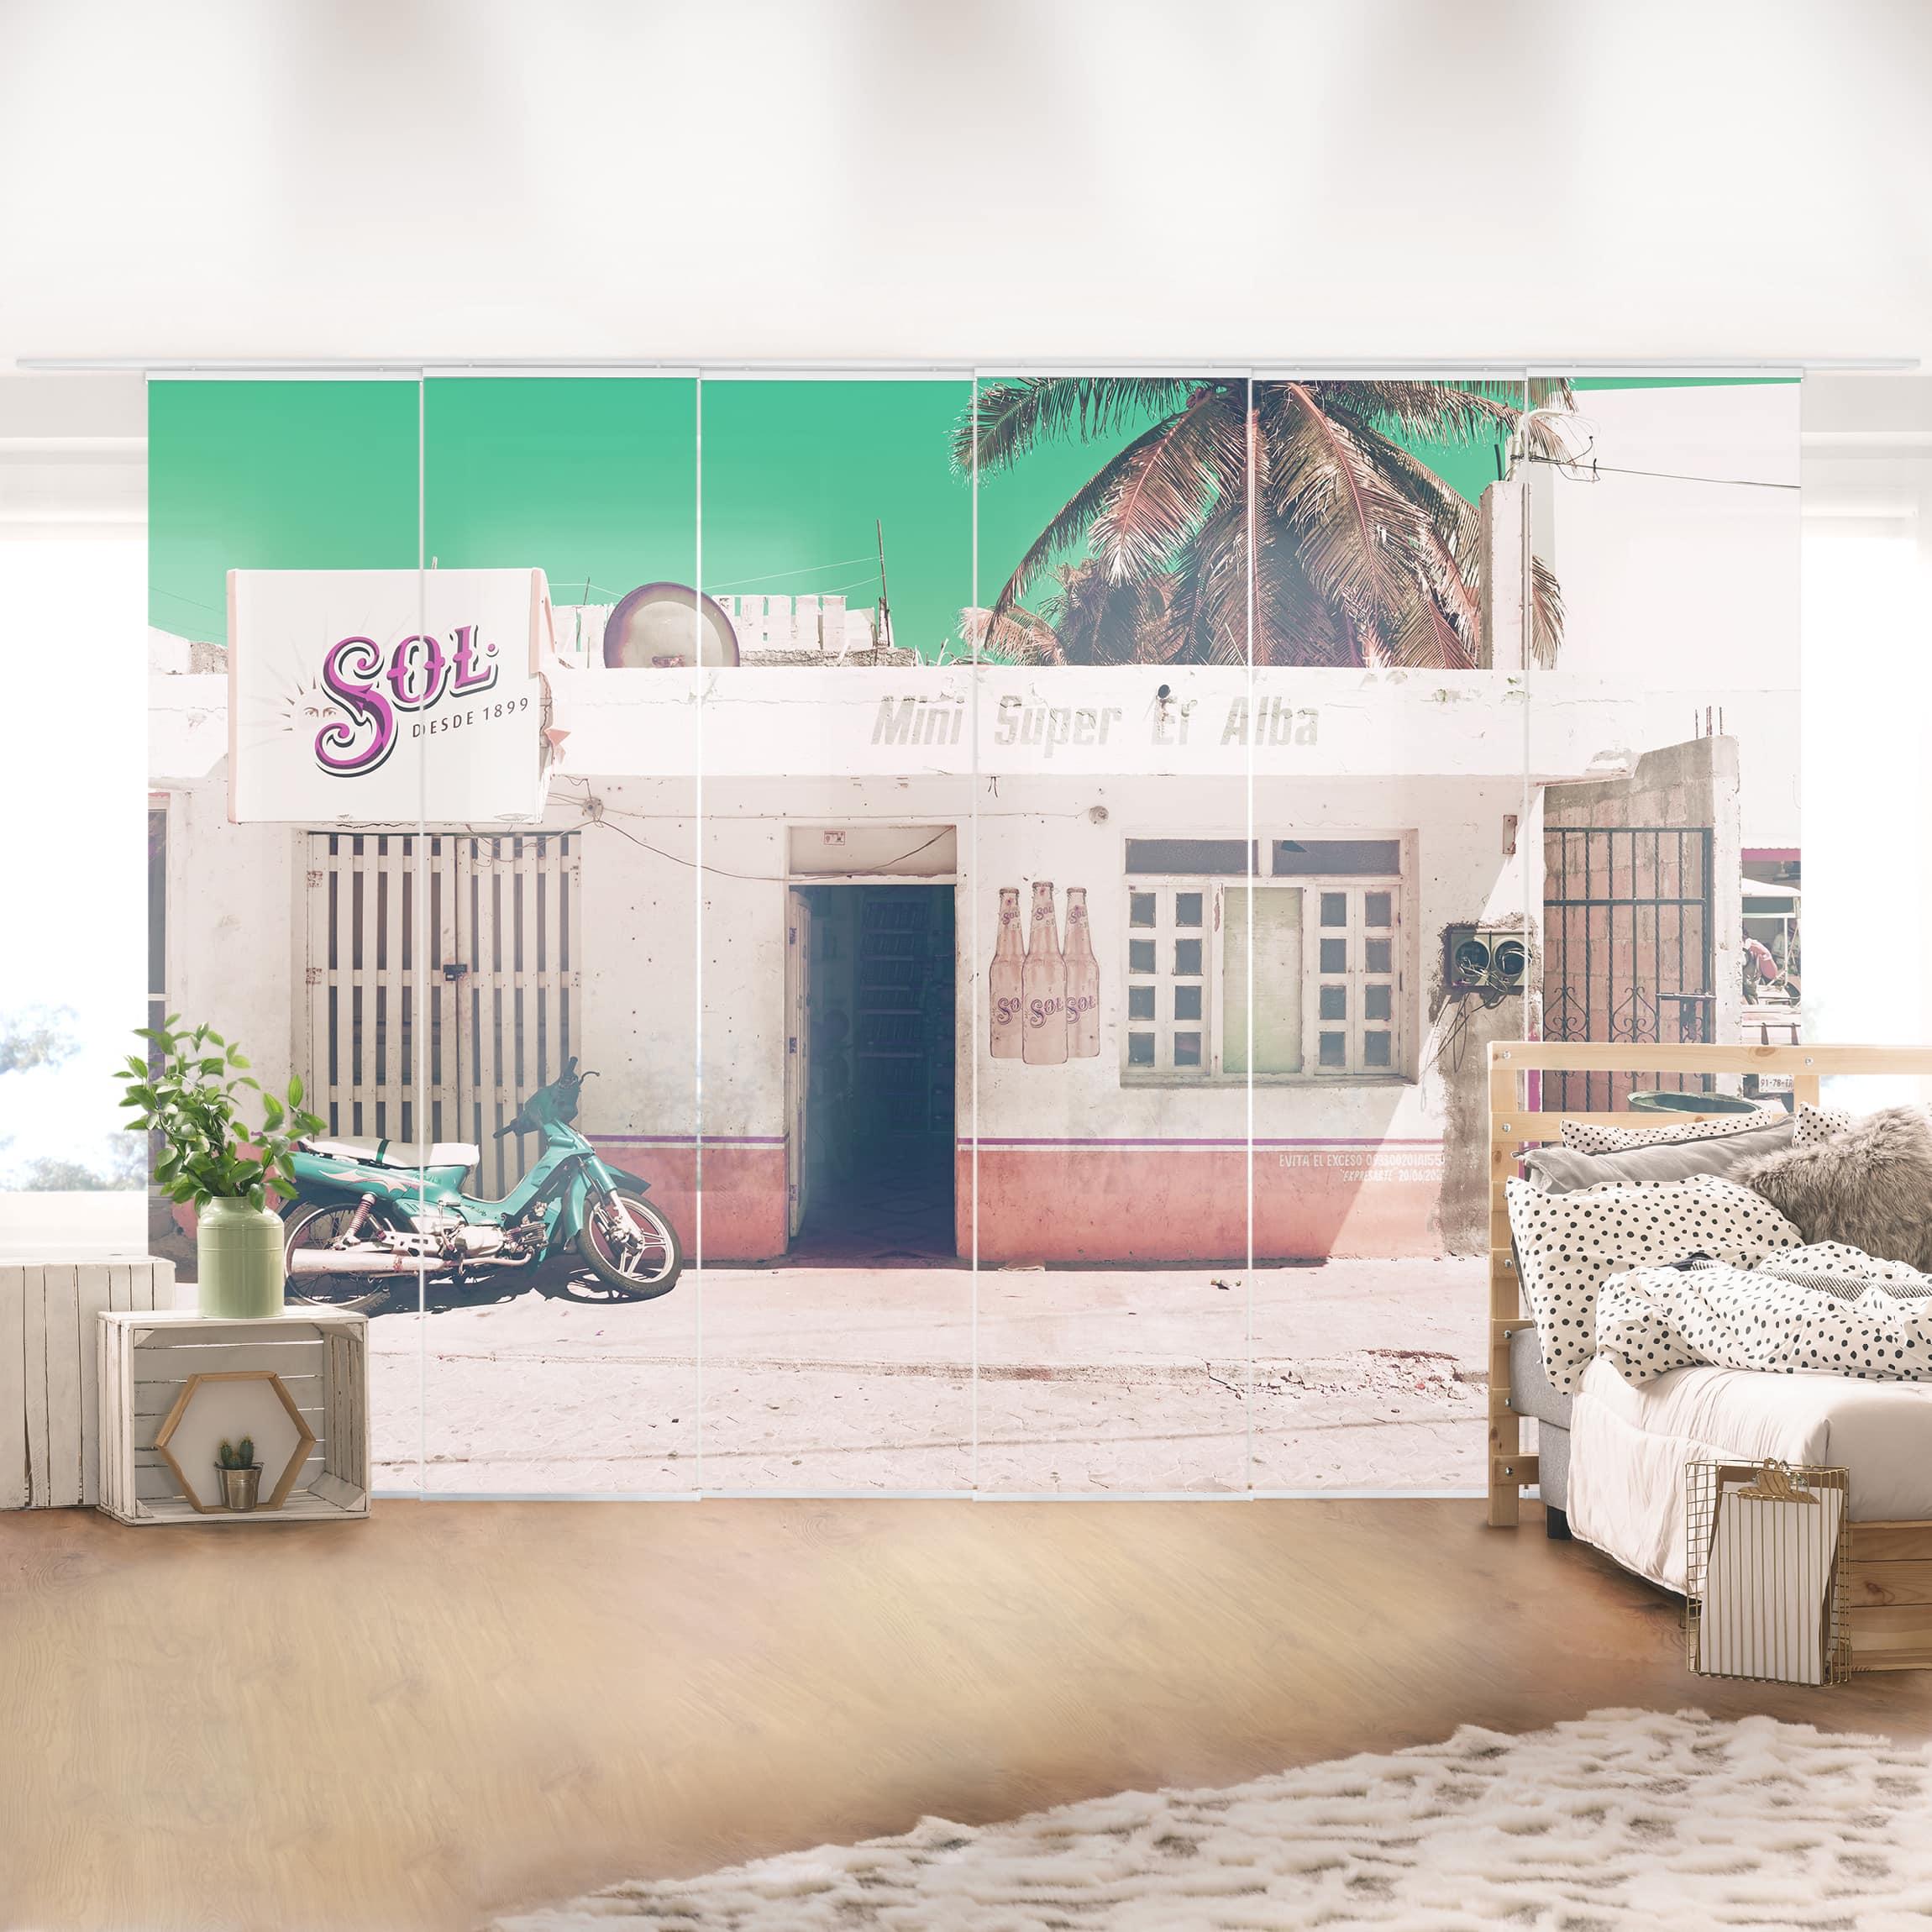 schiebegardinen set mini supermarkt vintage 6 fl chenvorh nge. Black Bedroom Furniture Sets. Home Design Ideas